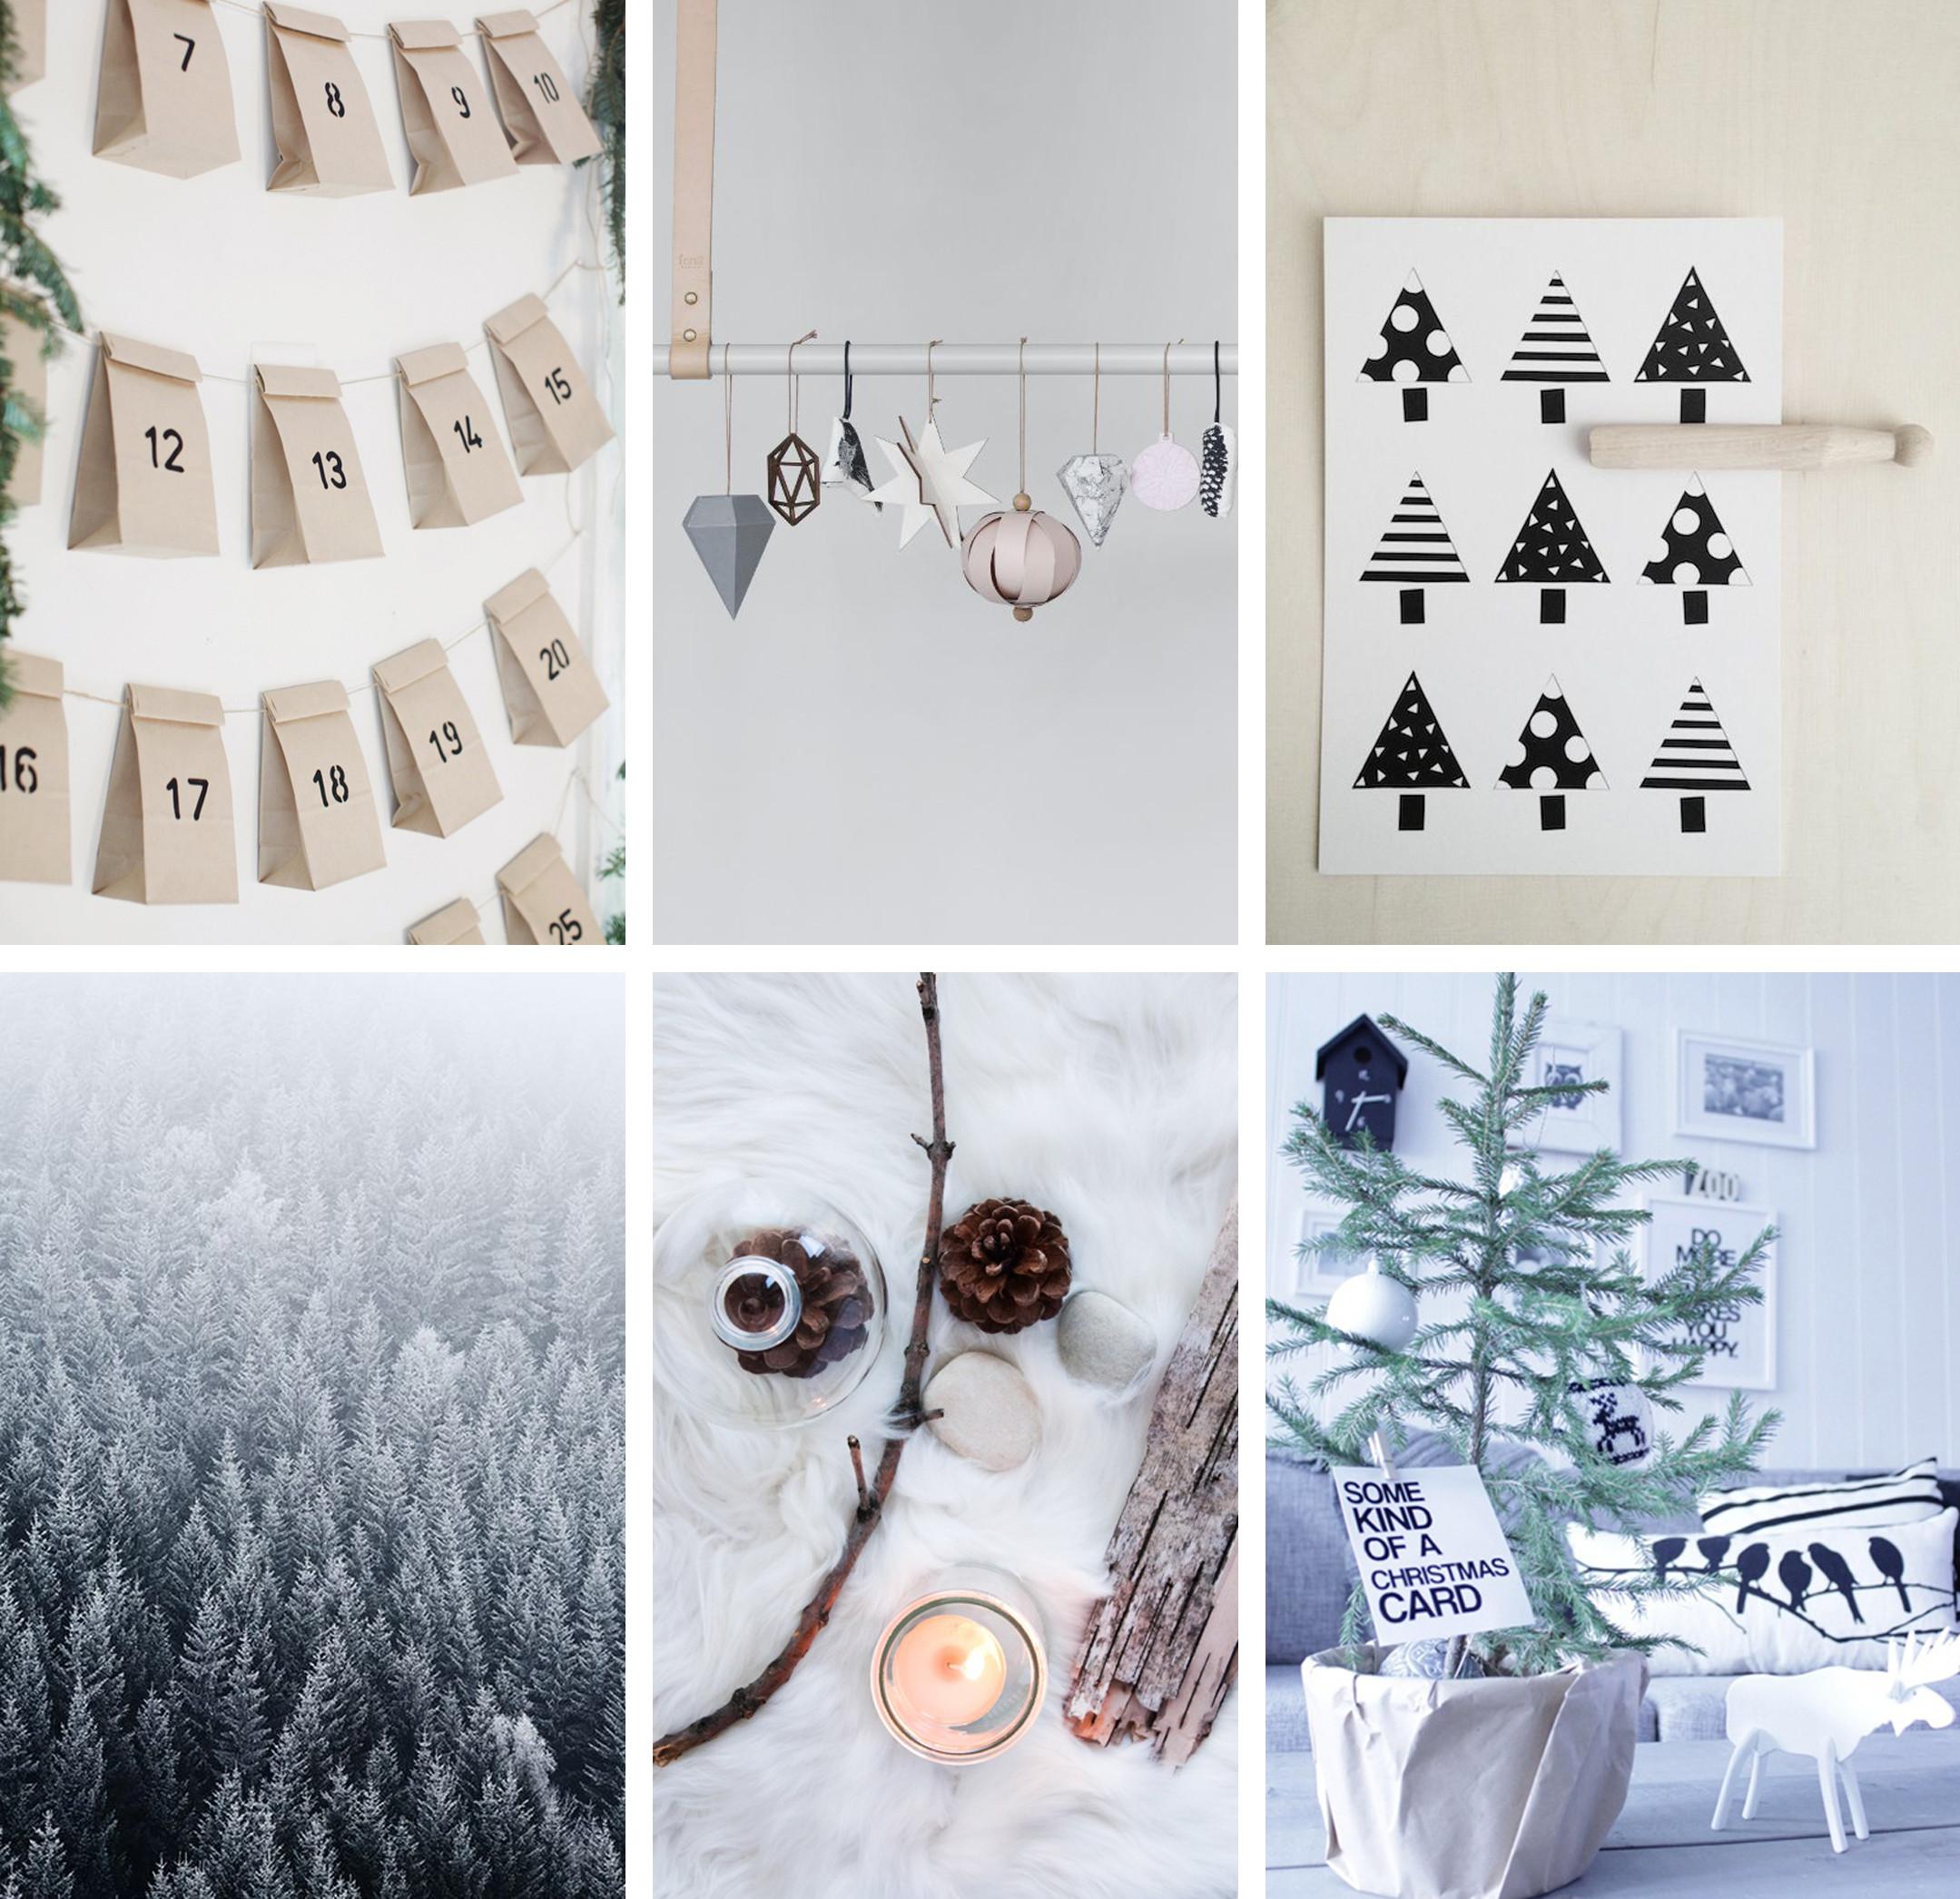 Best ideas about Christmas Decoration DIY Pinterest . Save or Pin christmas decoration inspiration diy xmas t ideas Now.